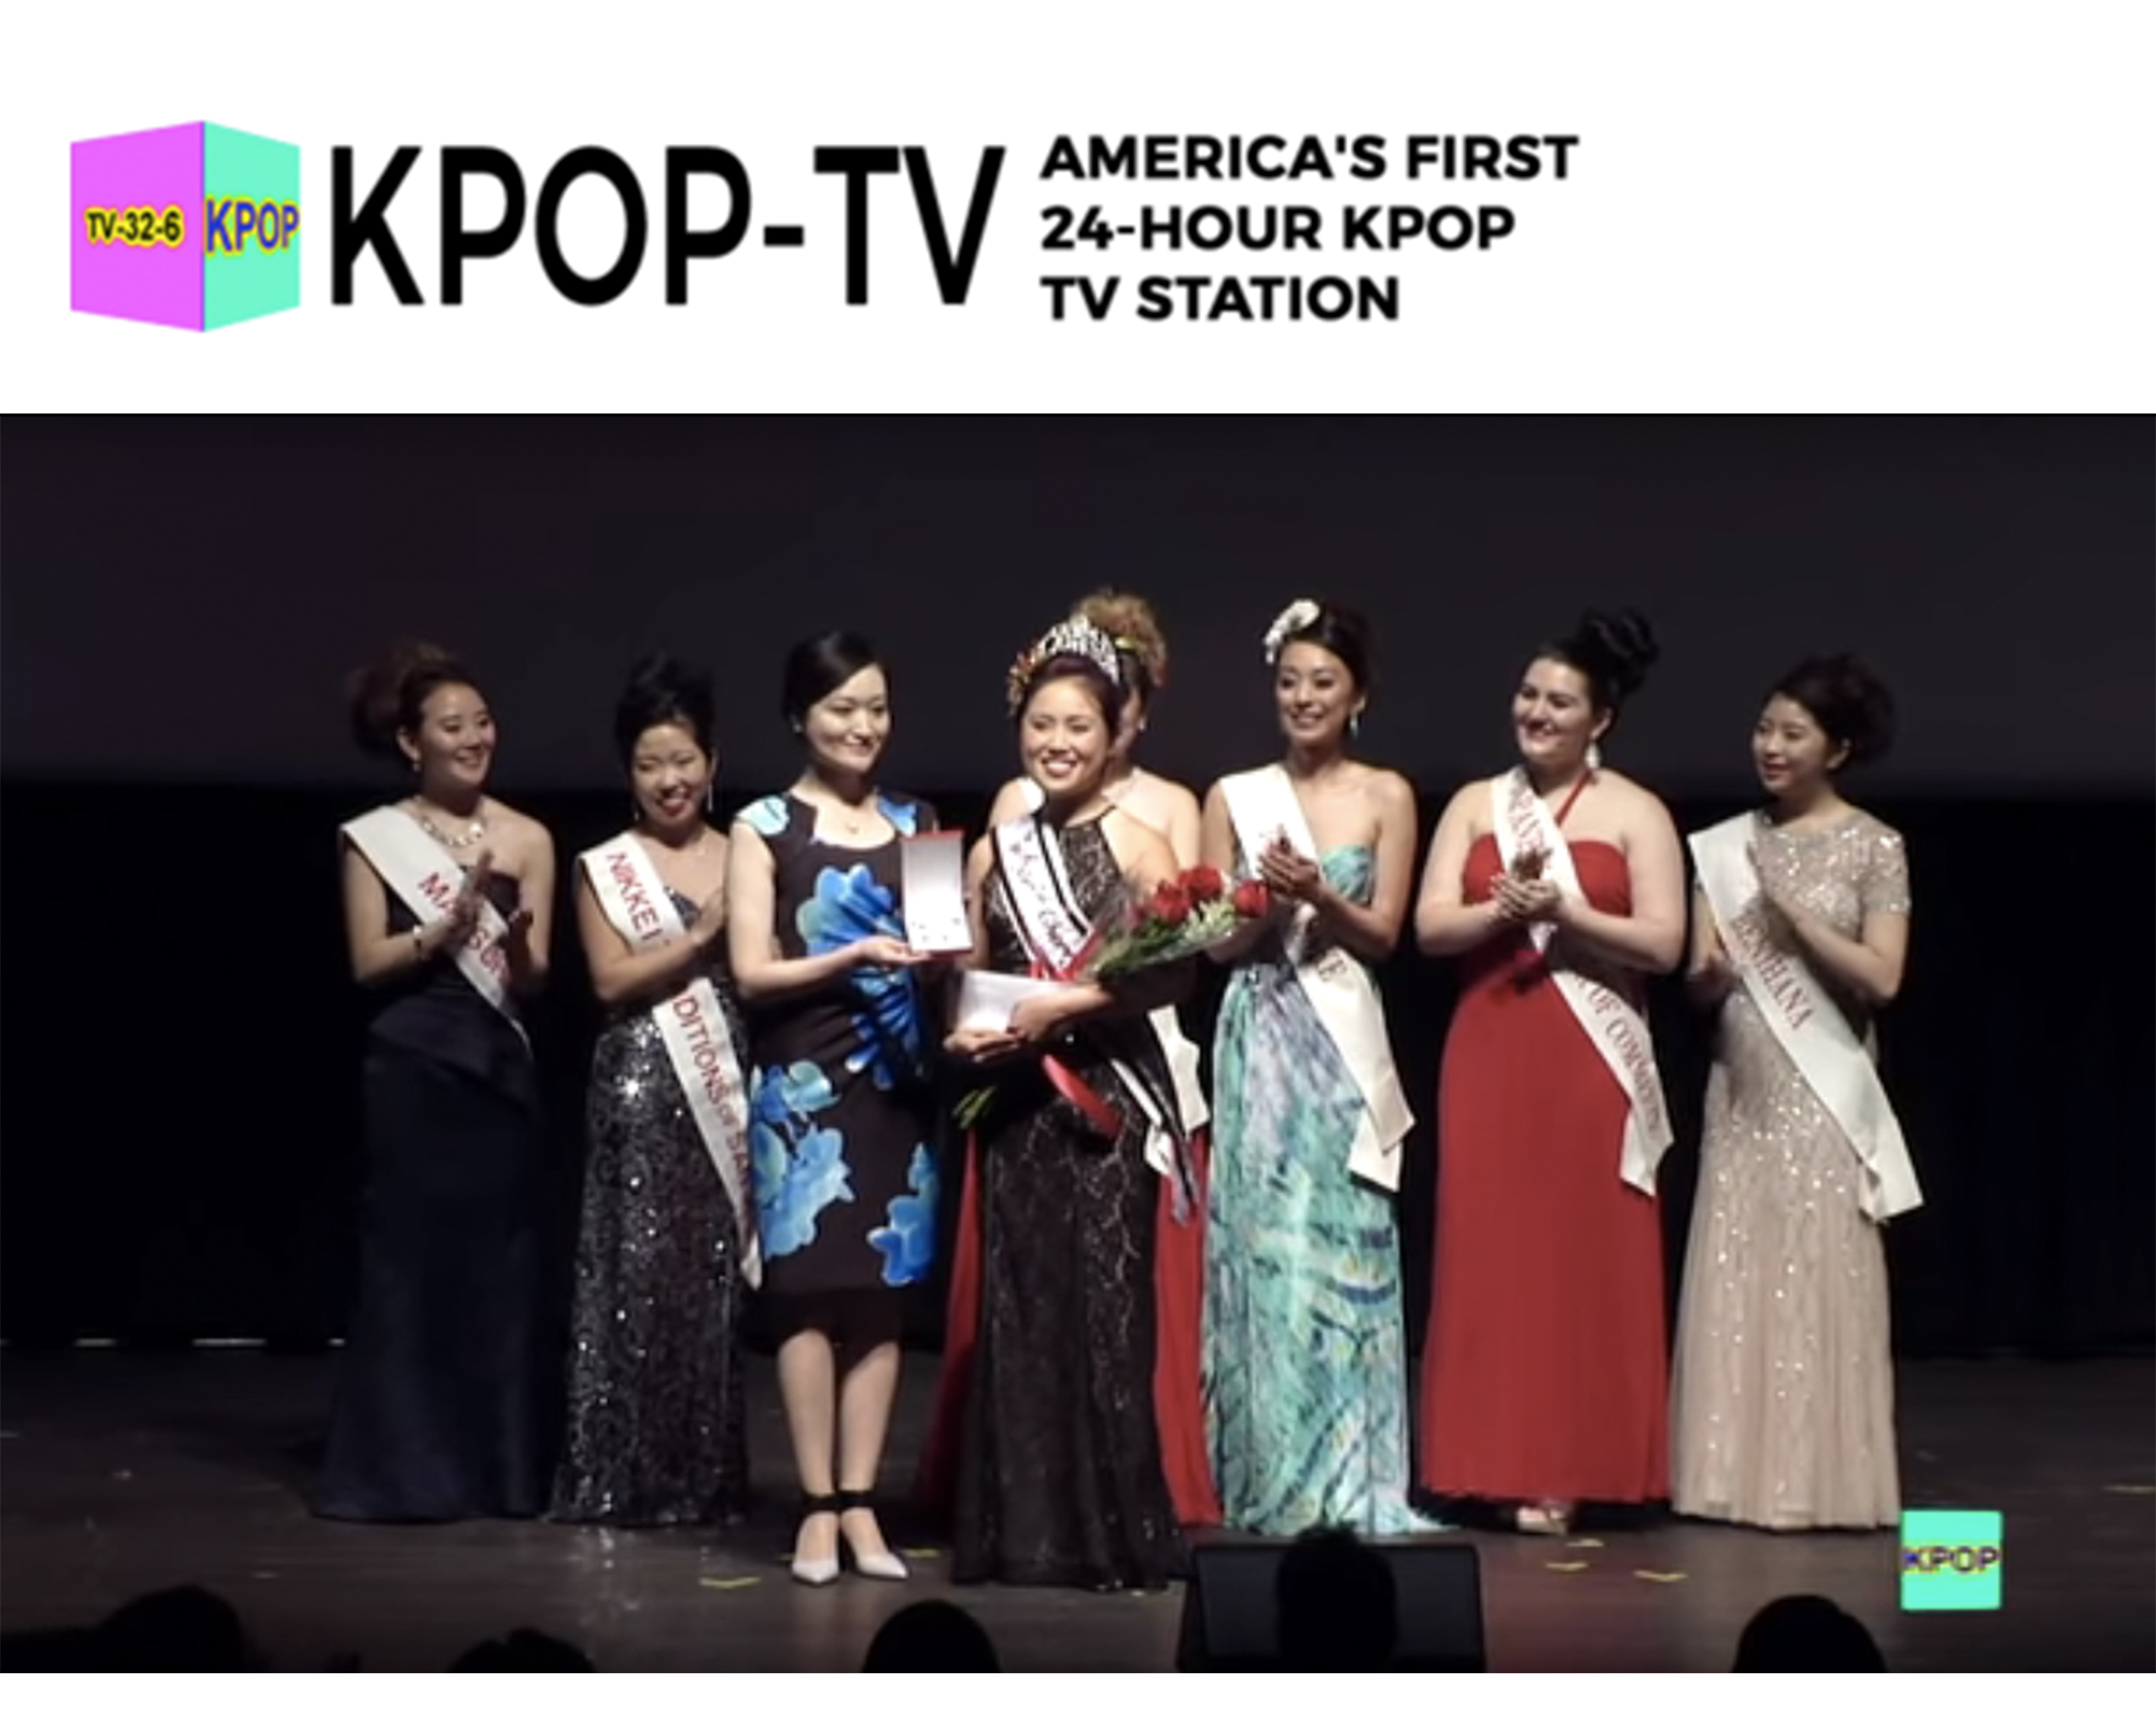 24hr K-pop TV 2016